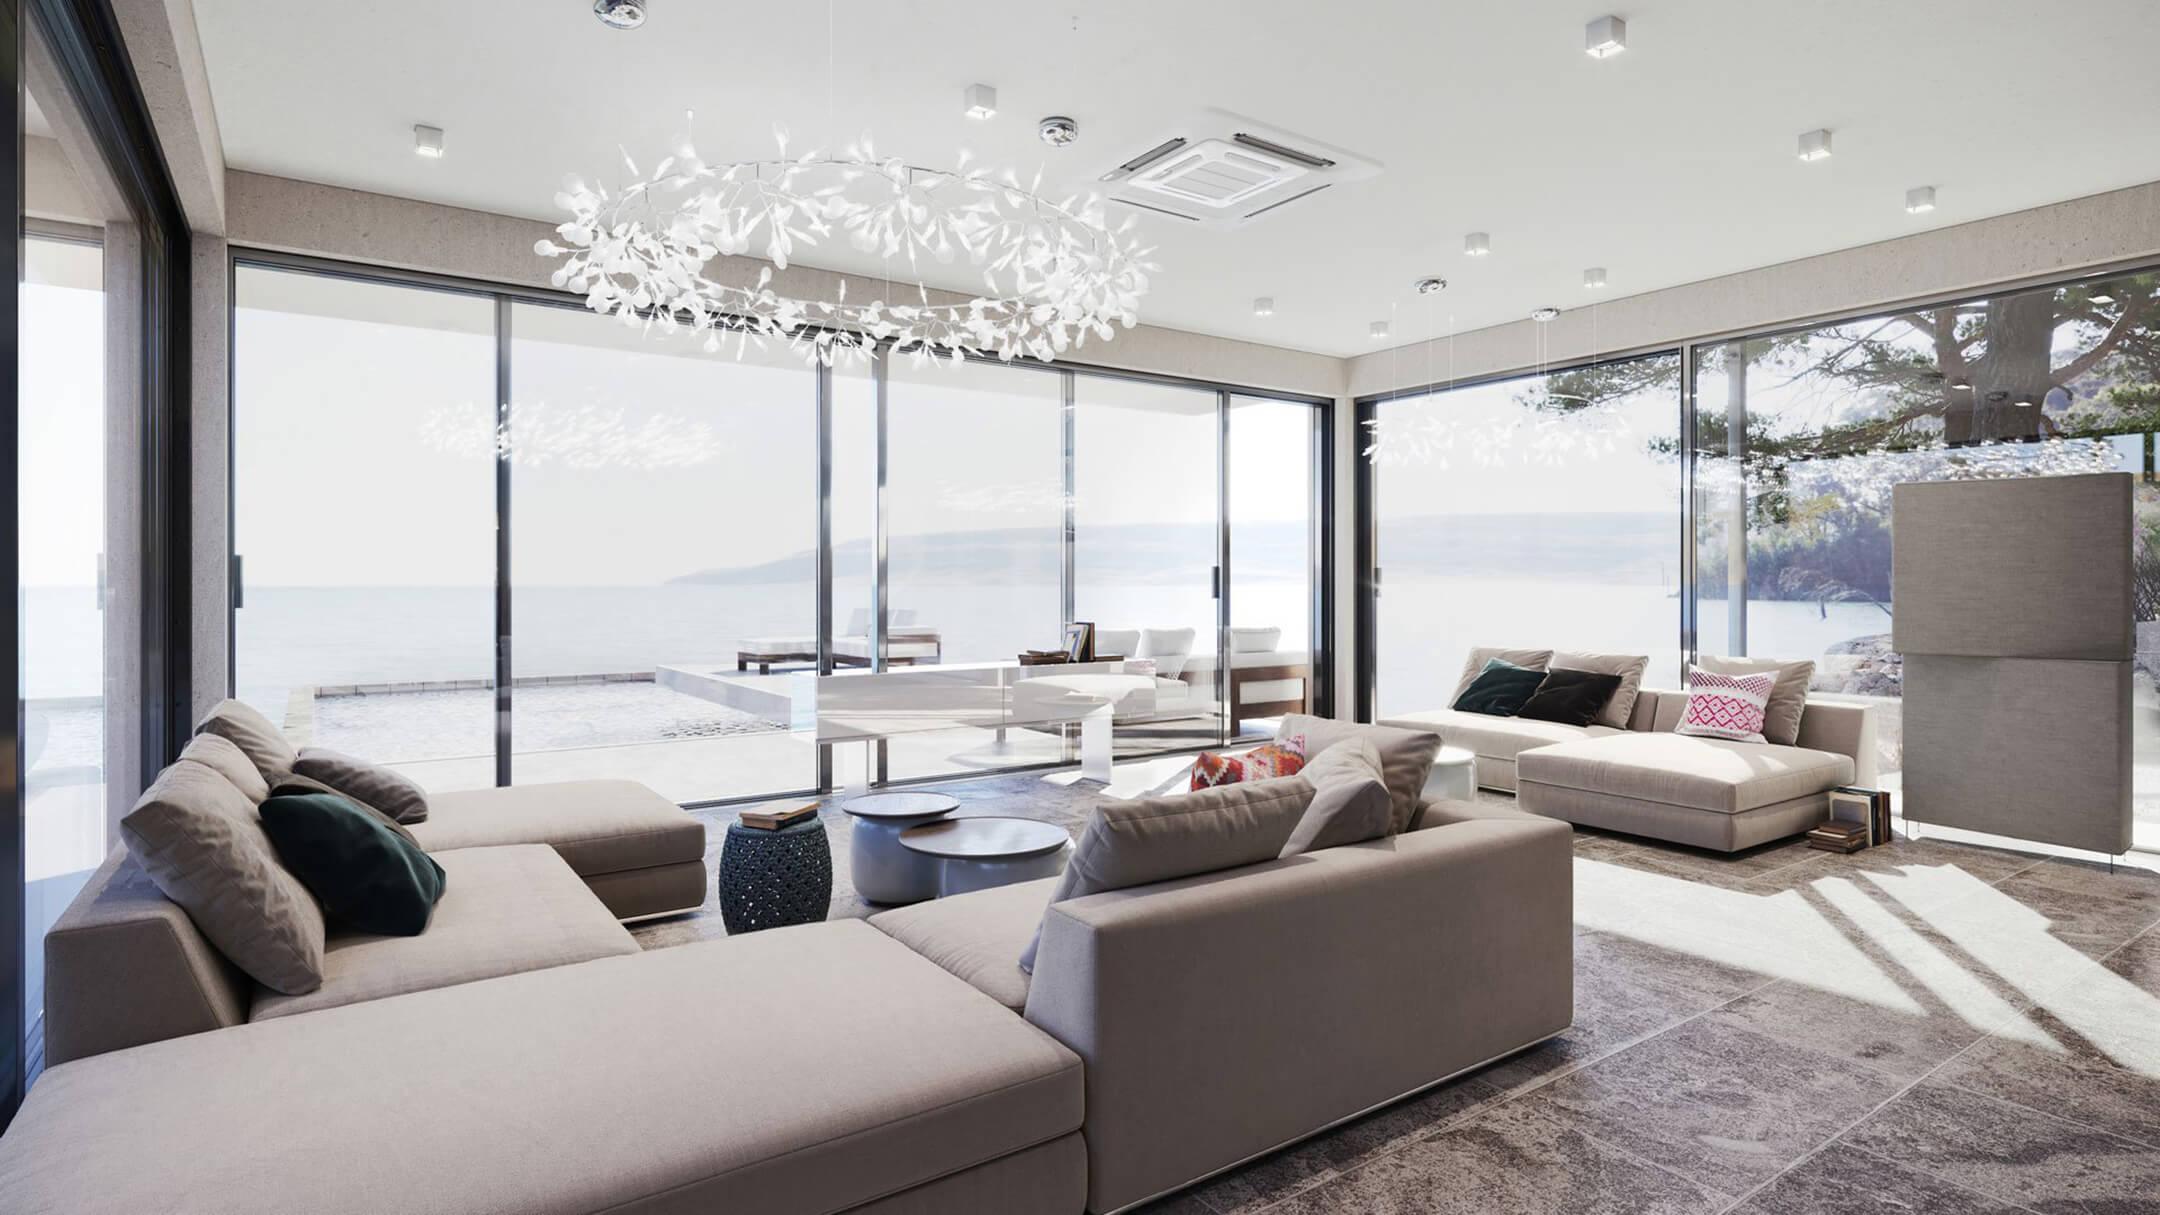 Inspirational CG Image of a Stylish Interior